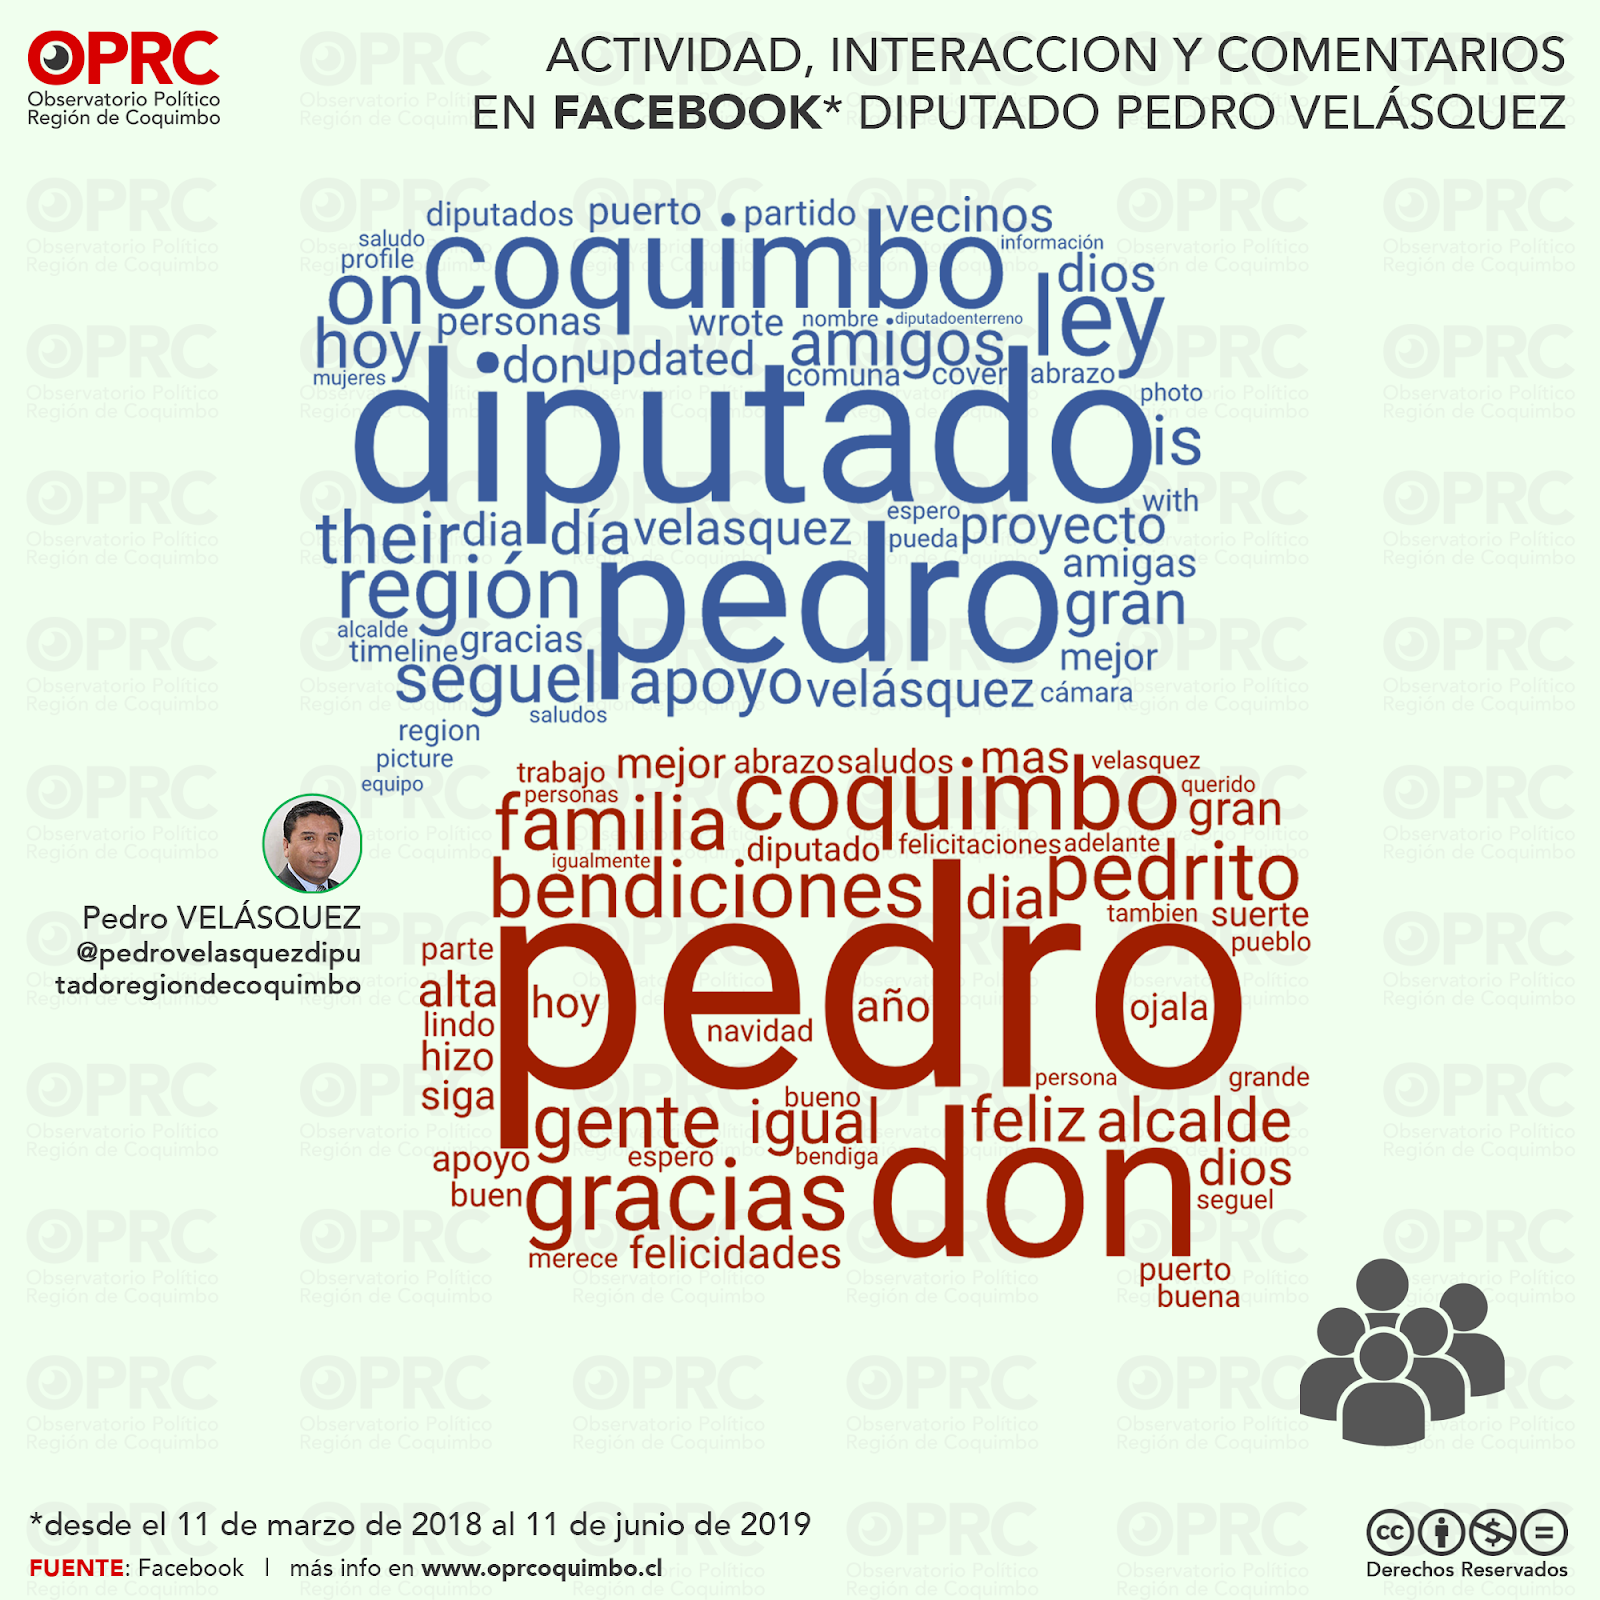 Interacciones en Facebook Diputado Pedro Velásquez